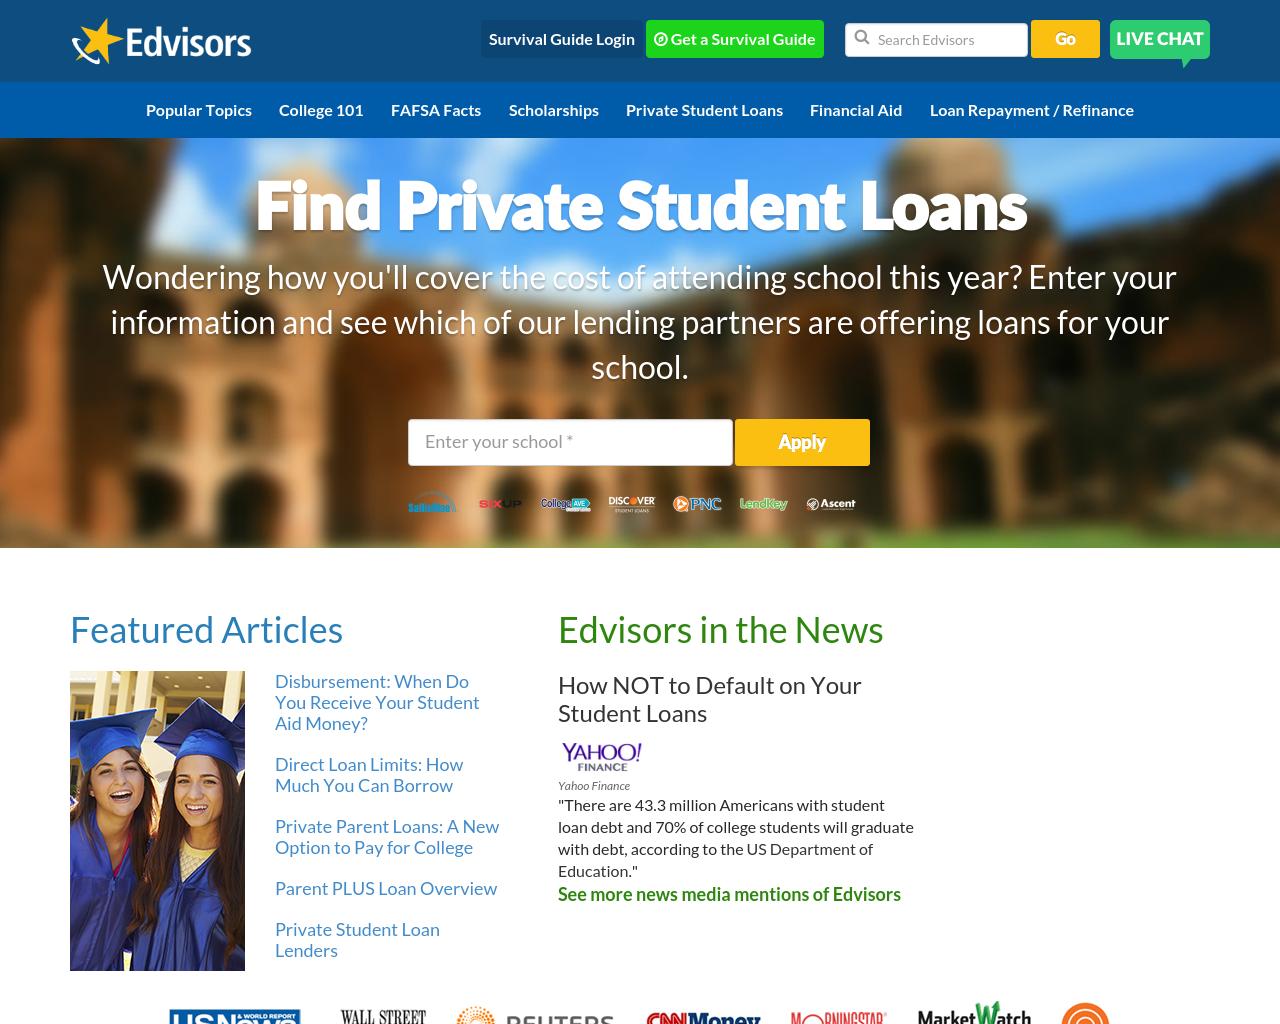 Edvisors-Network-Advertising-Reviews-Pricing